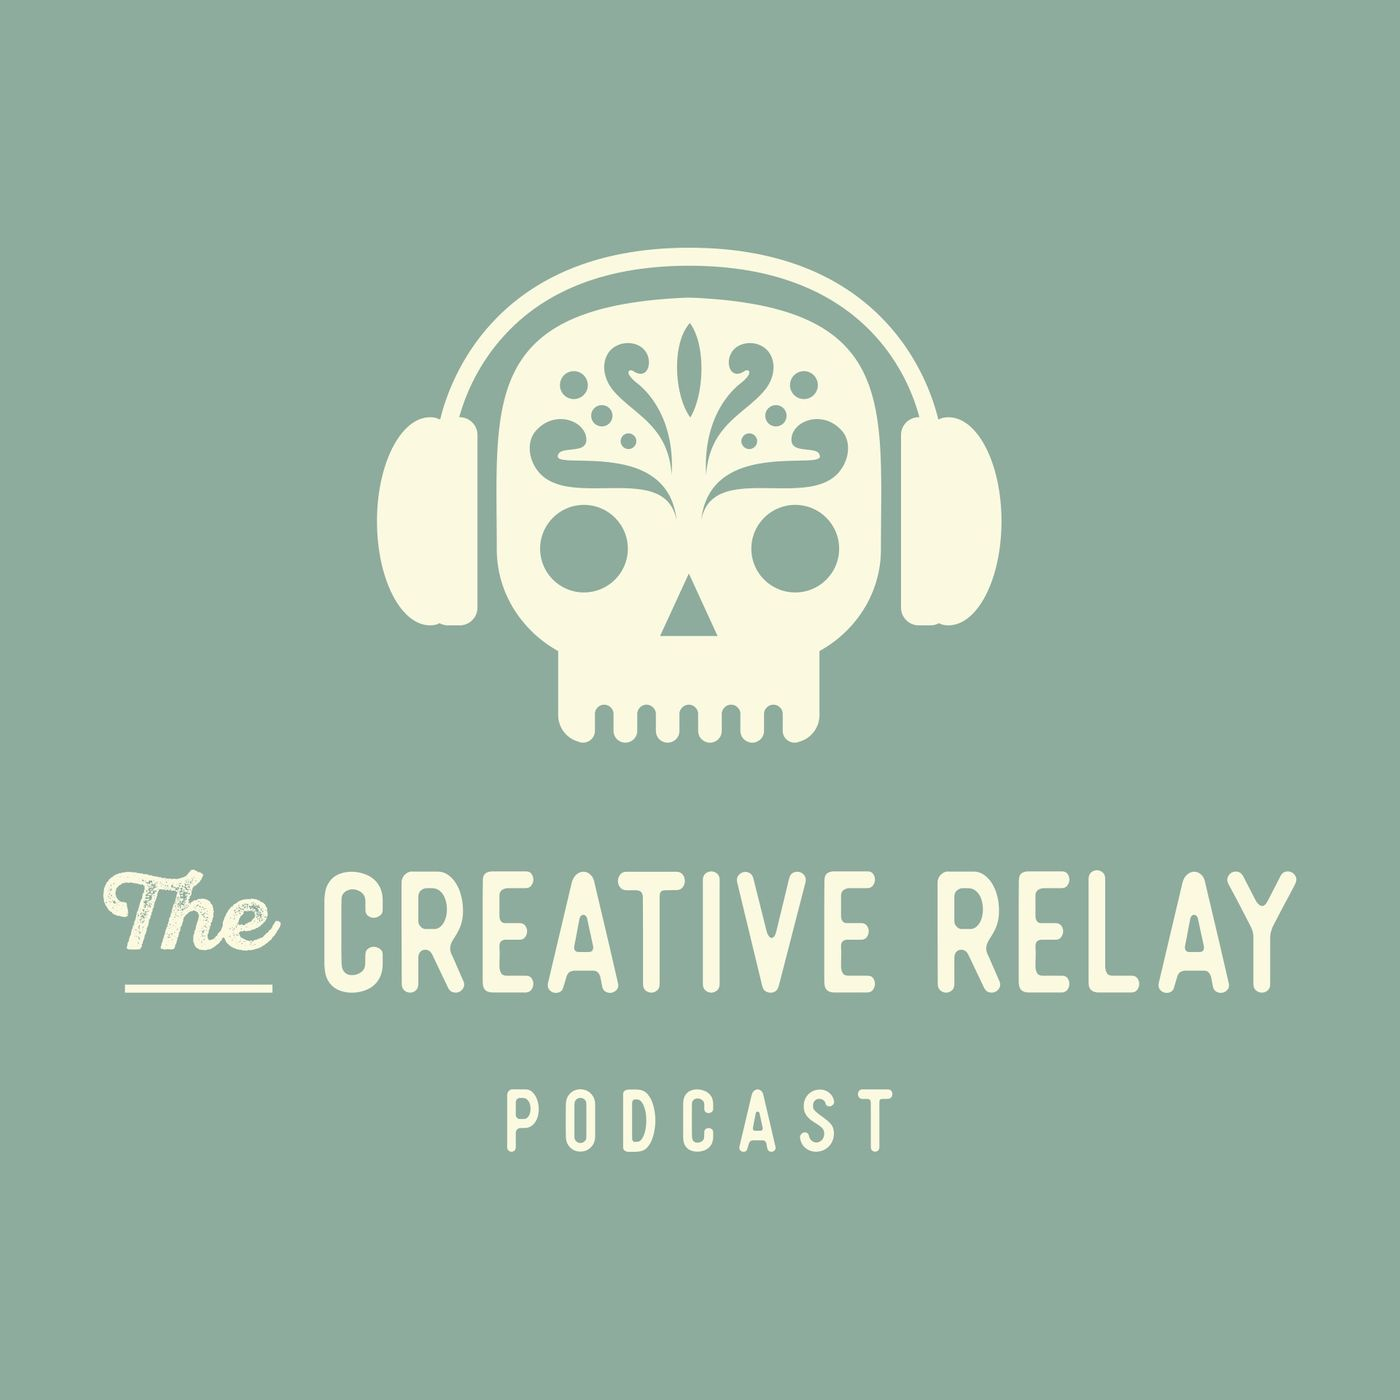 EP10 Steve Rogers talks to James McGrath